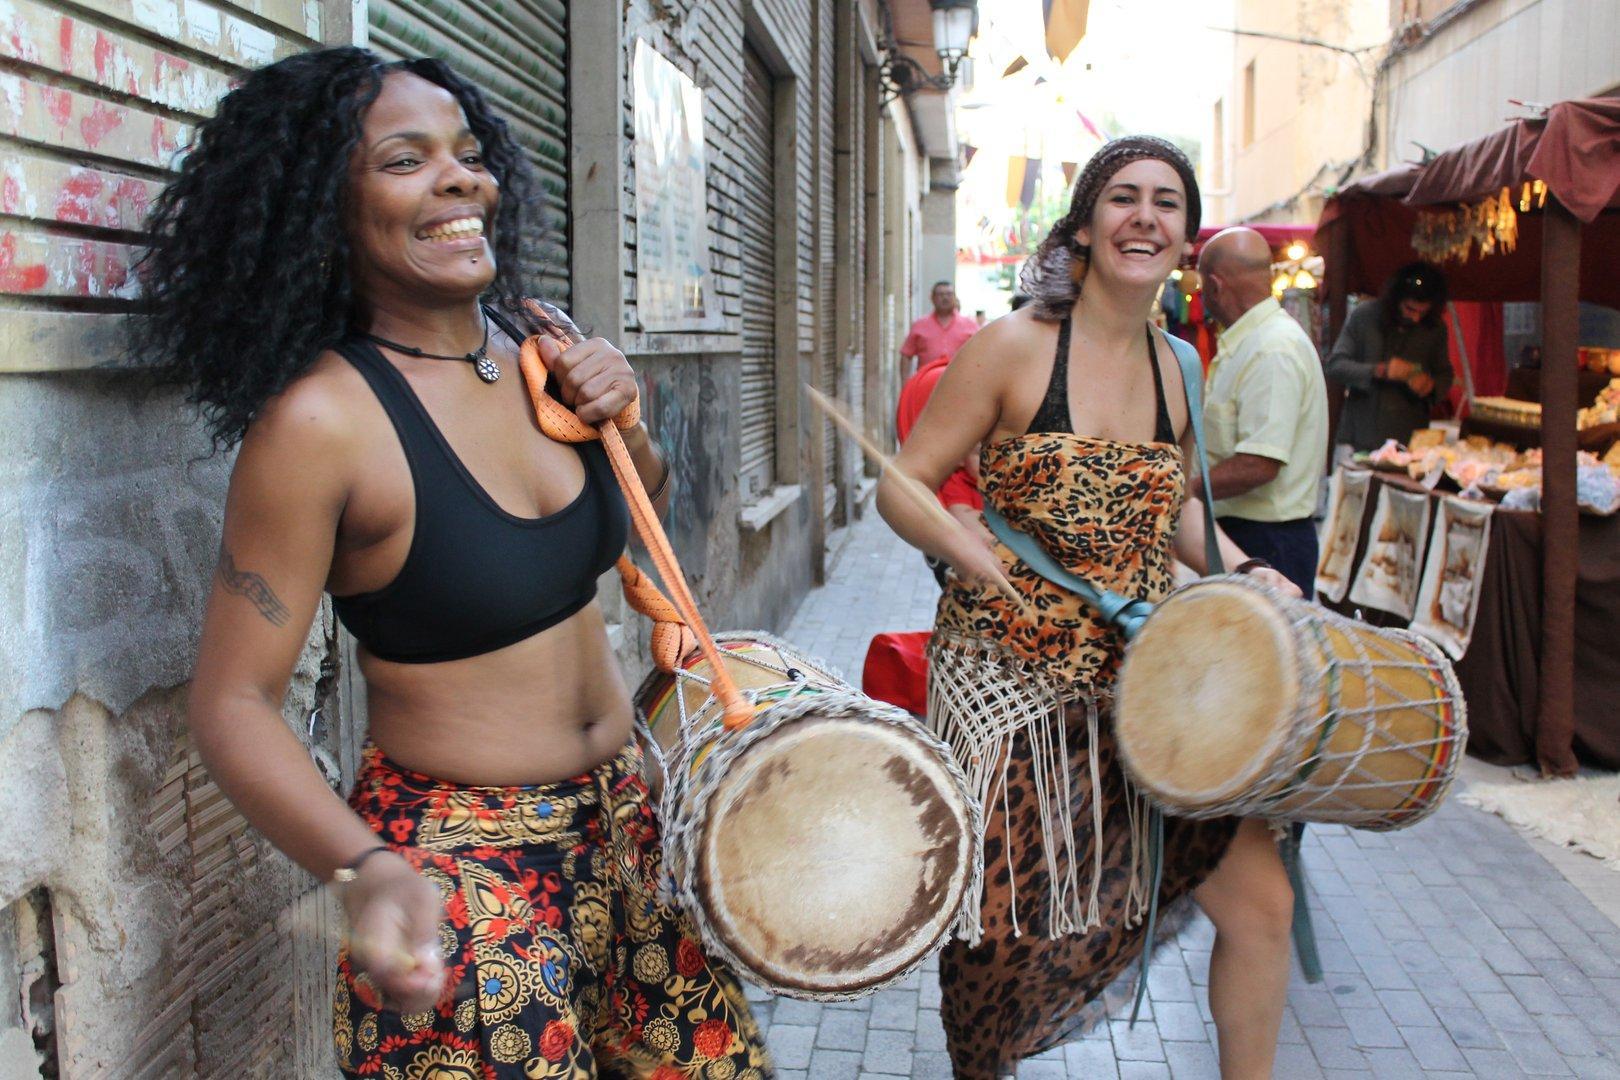 Mercadillo medieval fiestas Molina de Segura 2012